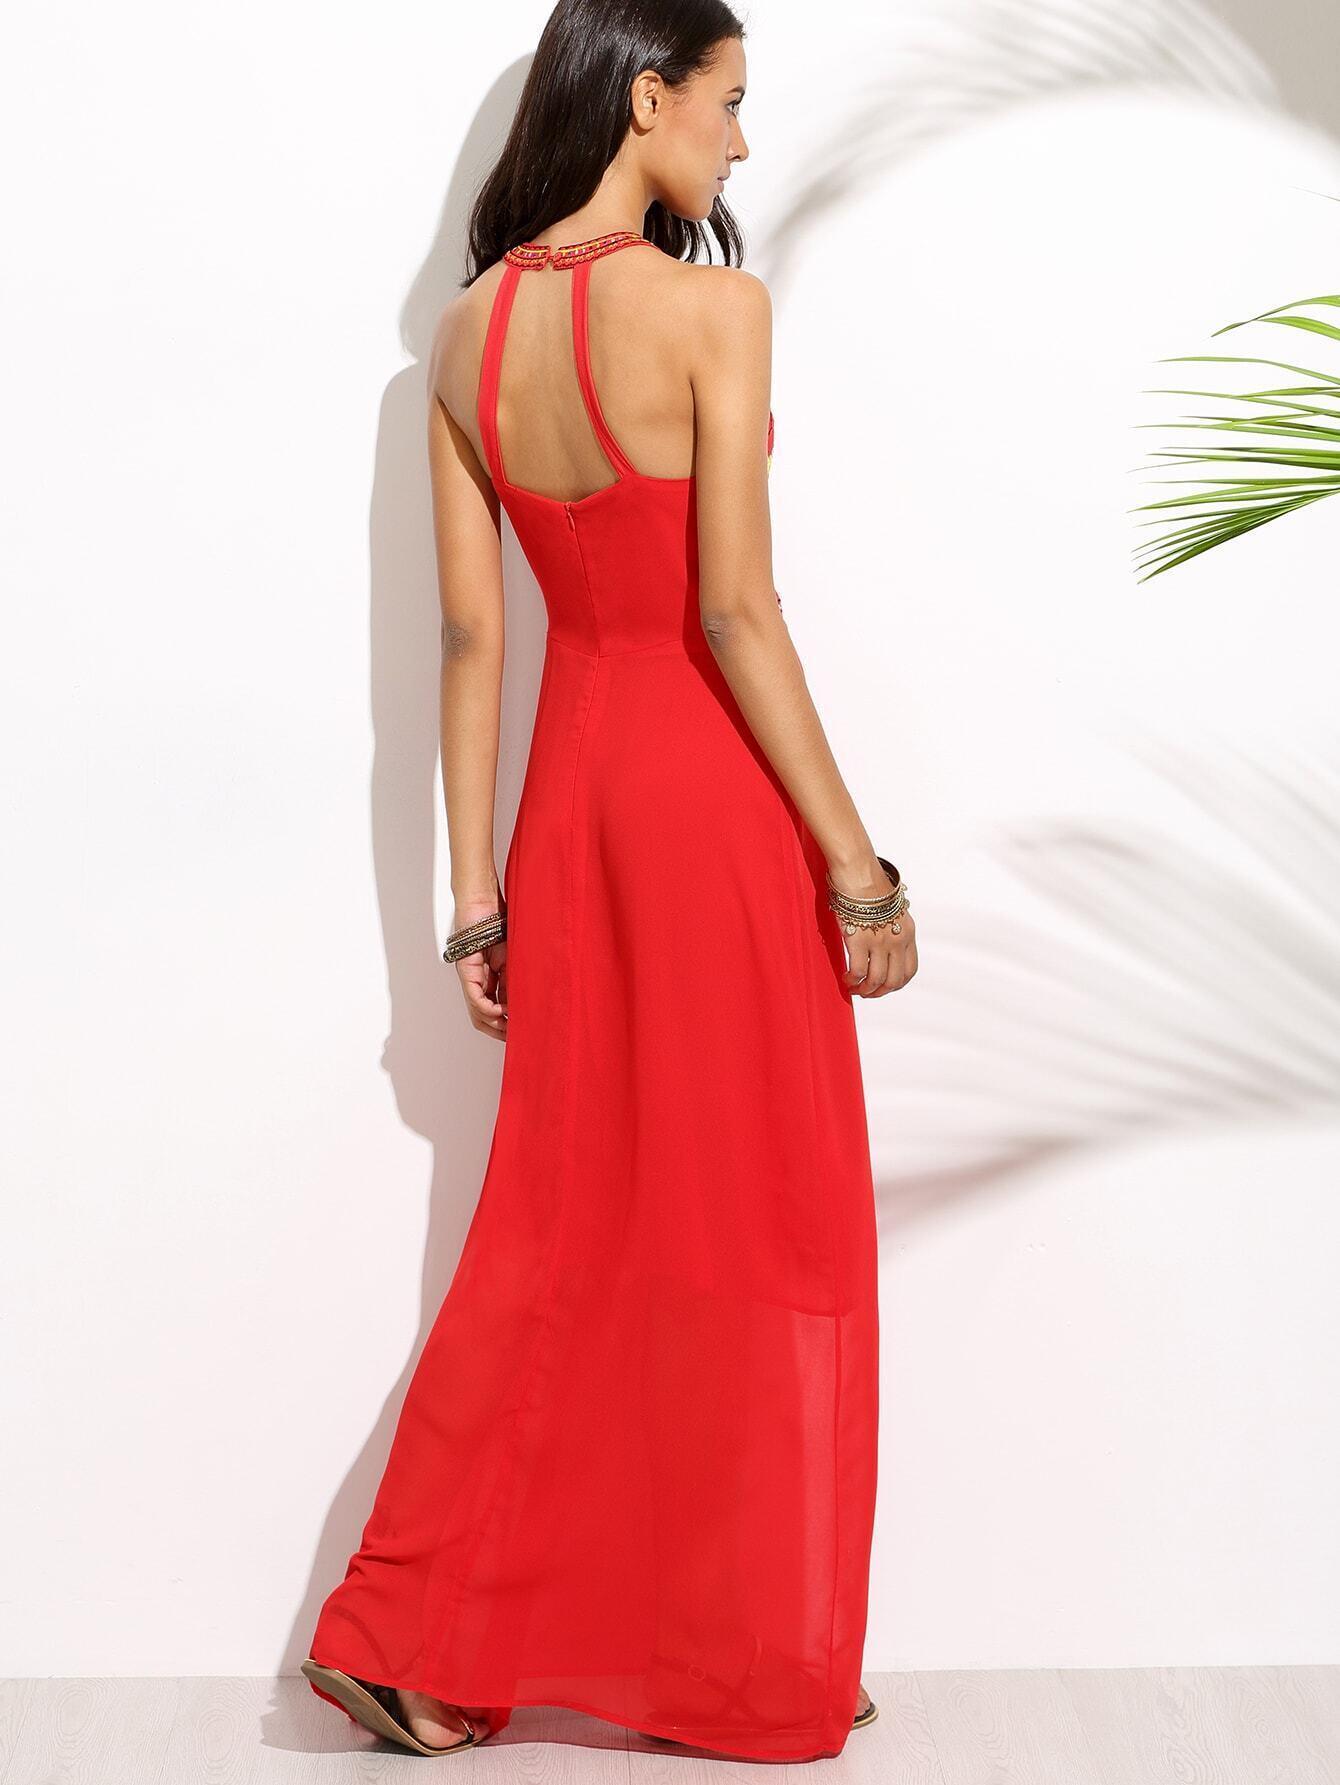 Robe longue ras de cou avec broderie rouge french romwe for Interieur paupiere inferieure rouge